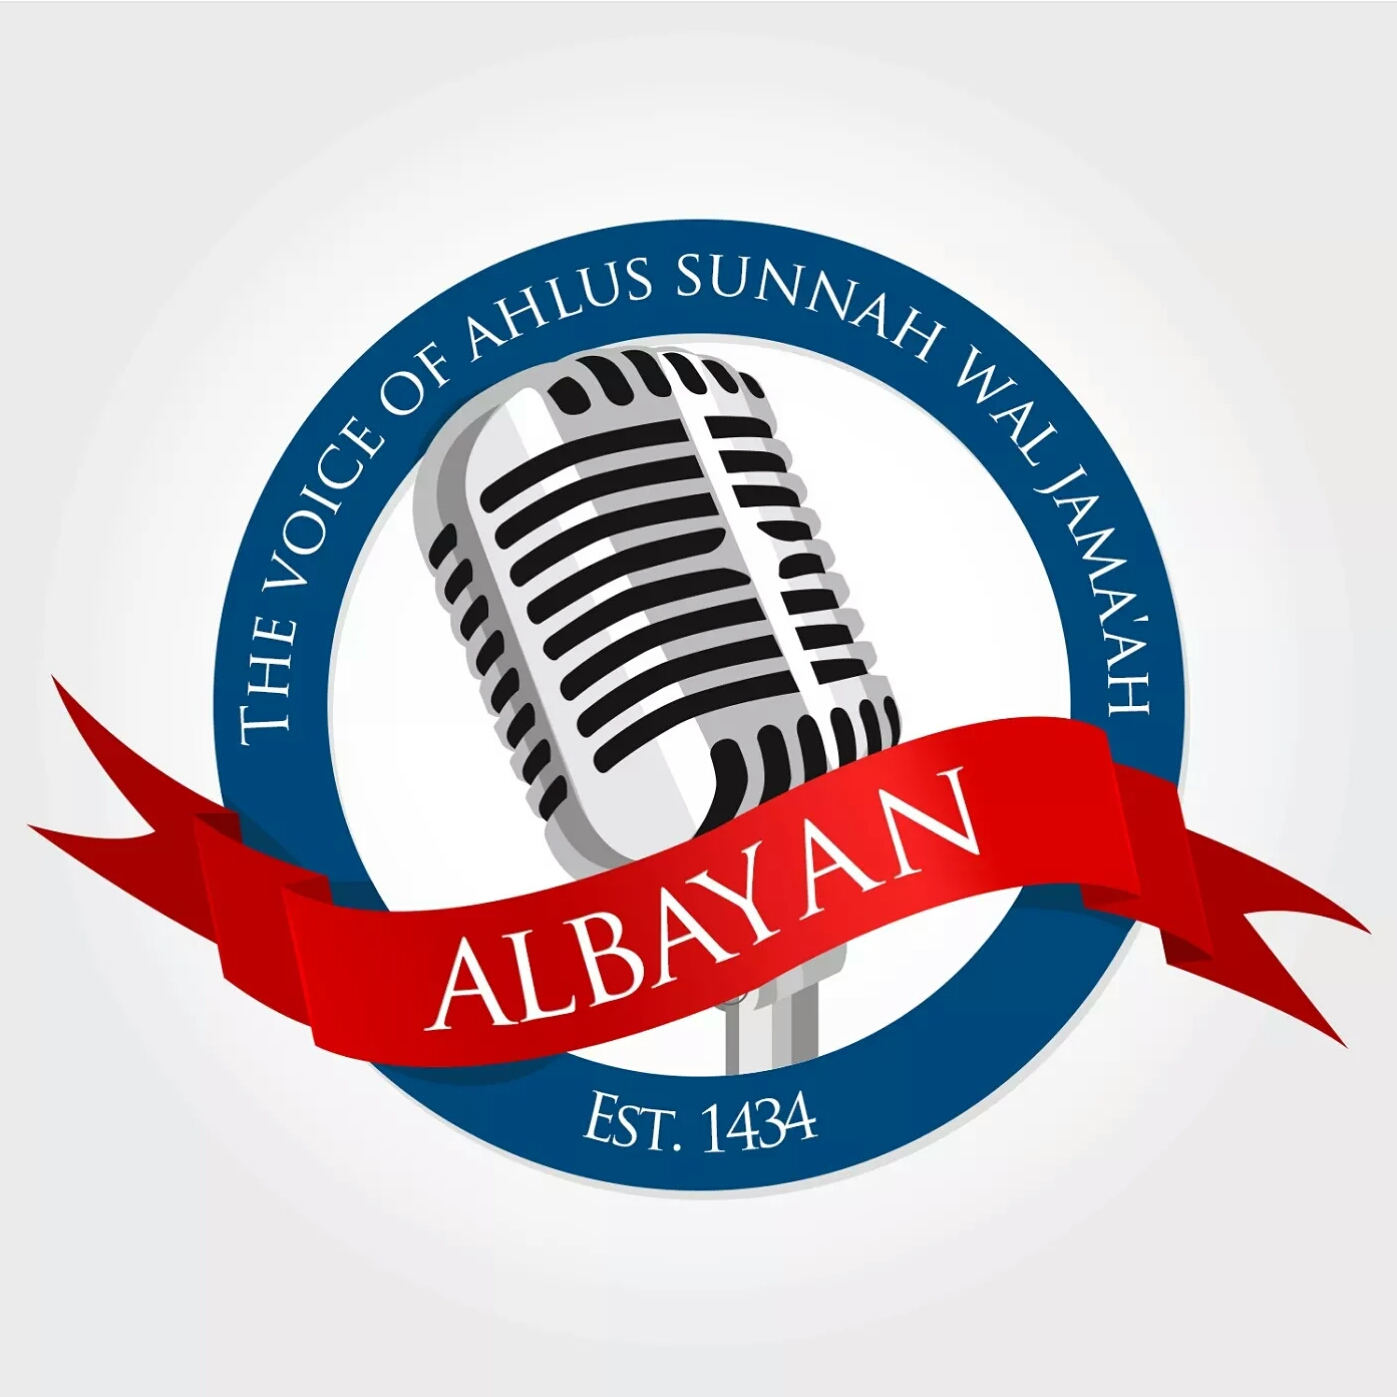 Albayan Radio - ASWJ Australia